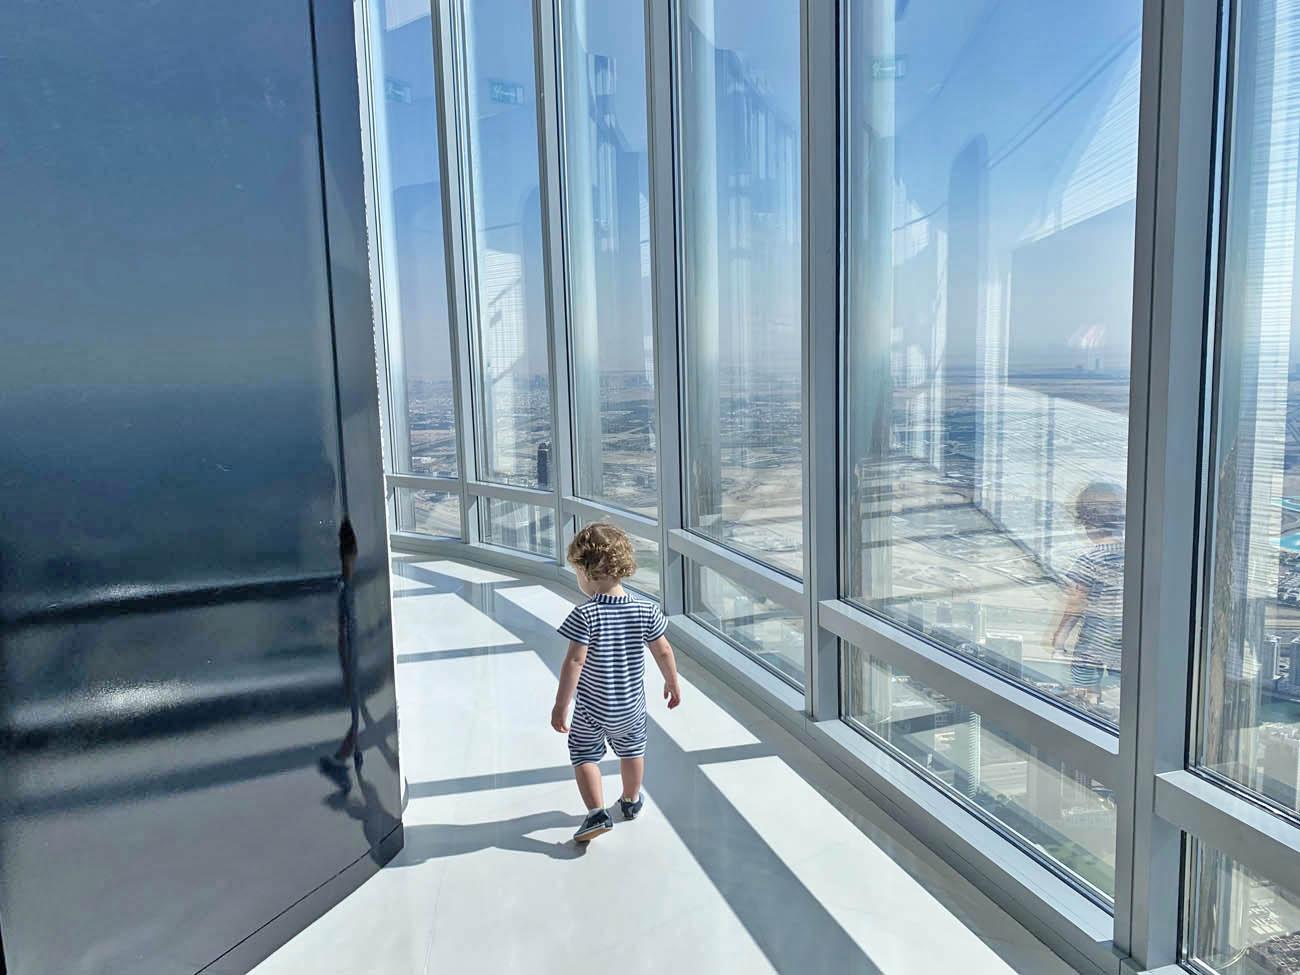 Burj Khalifa observatorio 148 andar